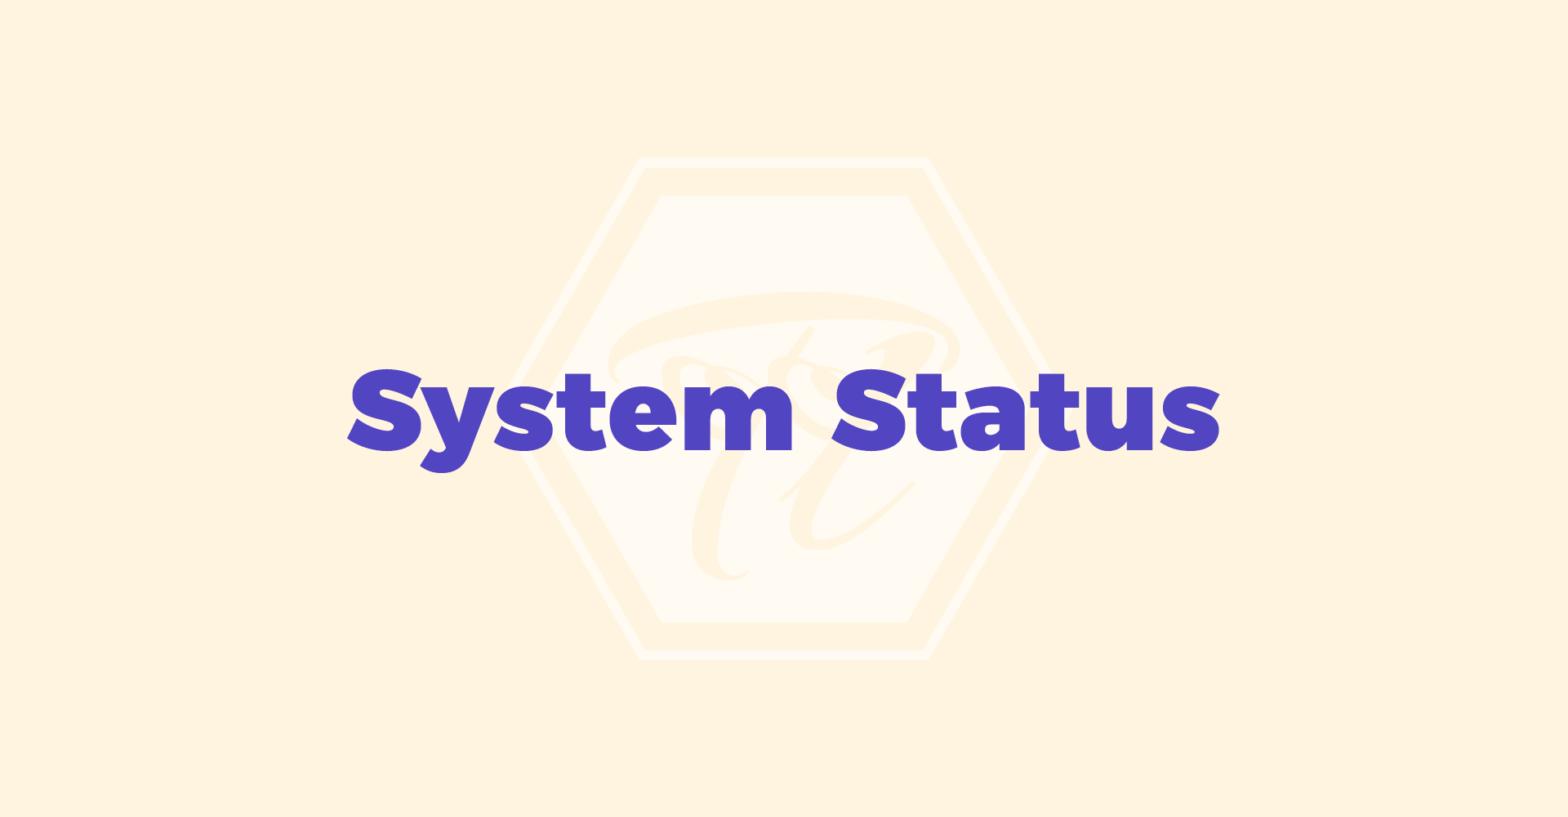 system_status 3 1568x817